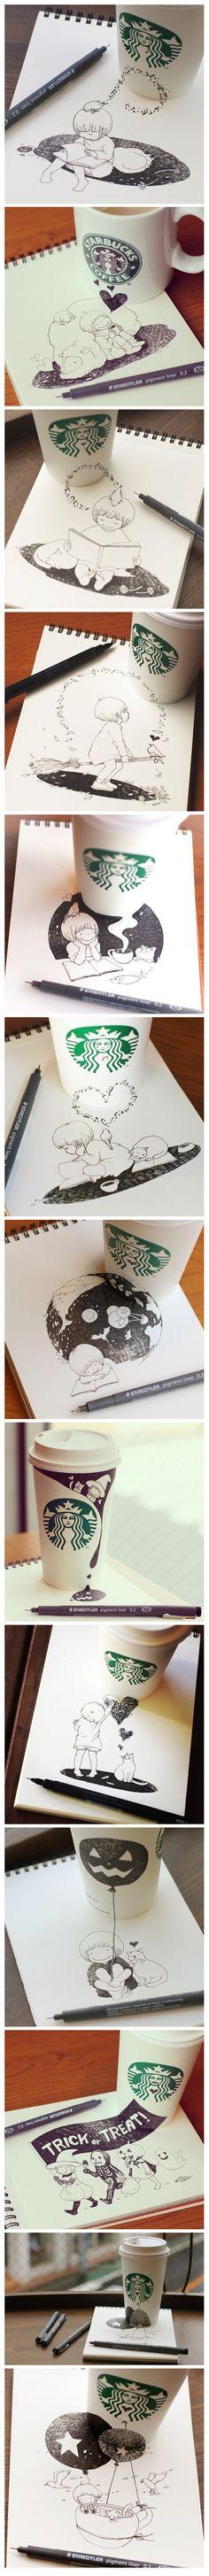 Lovely doodles by Japanese artist Tomoko Shintani.